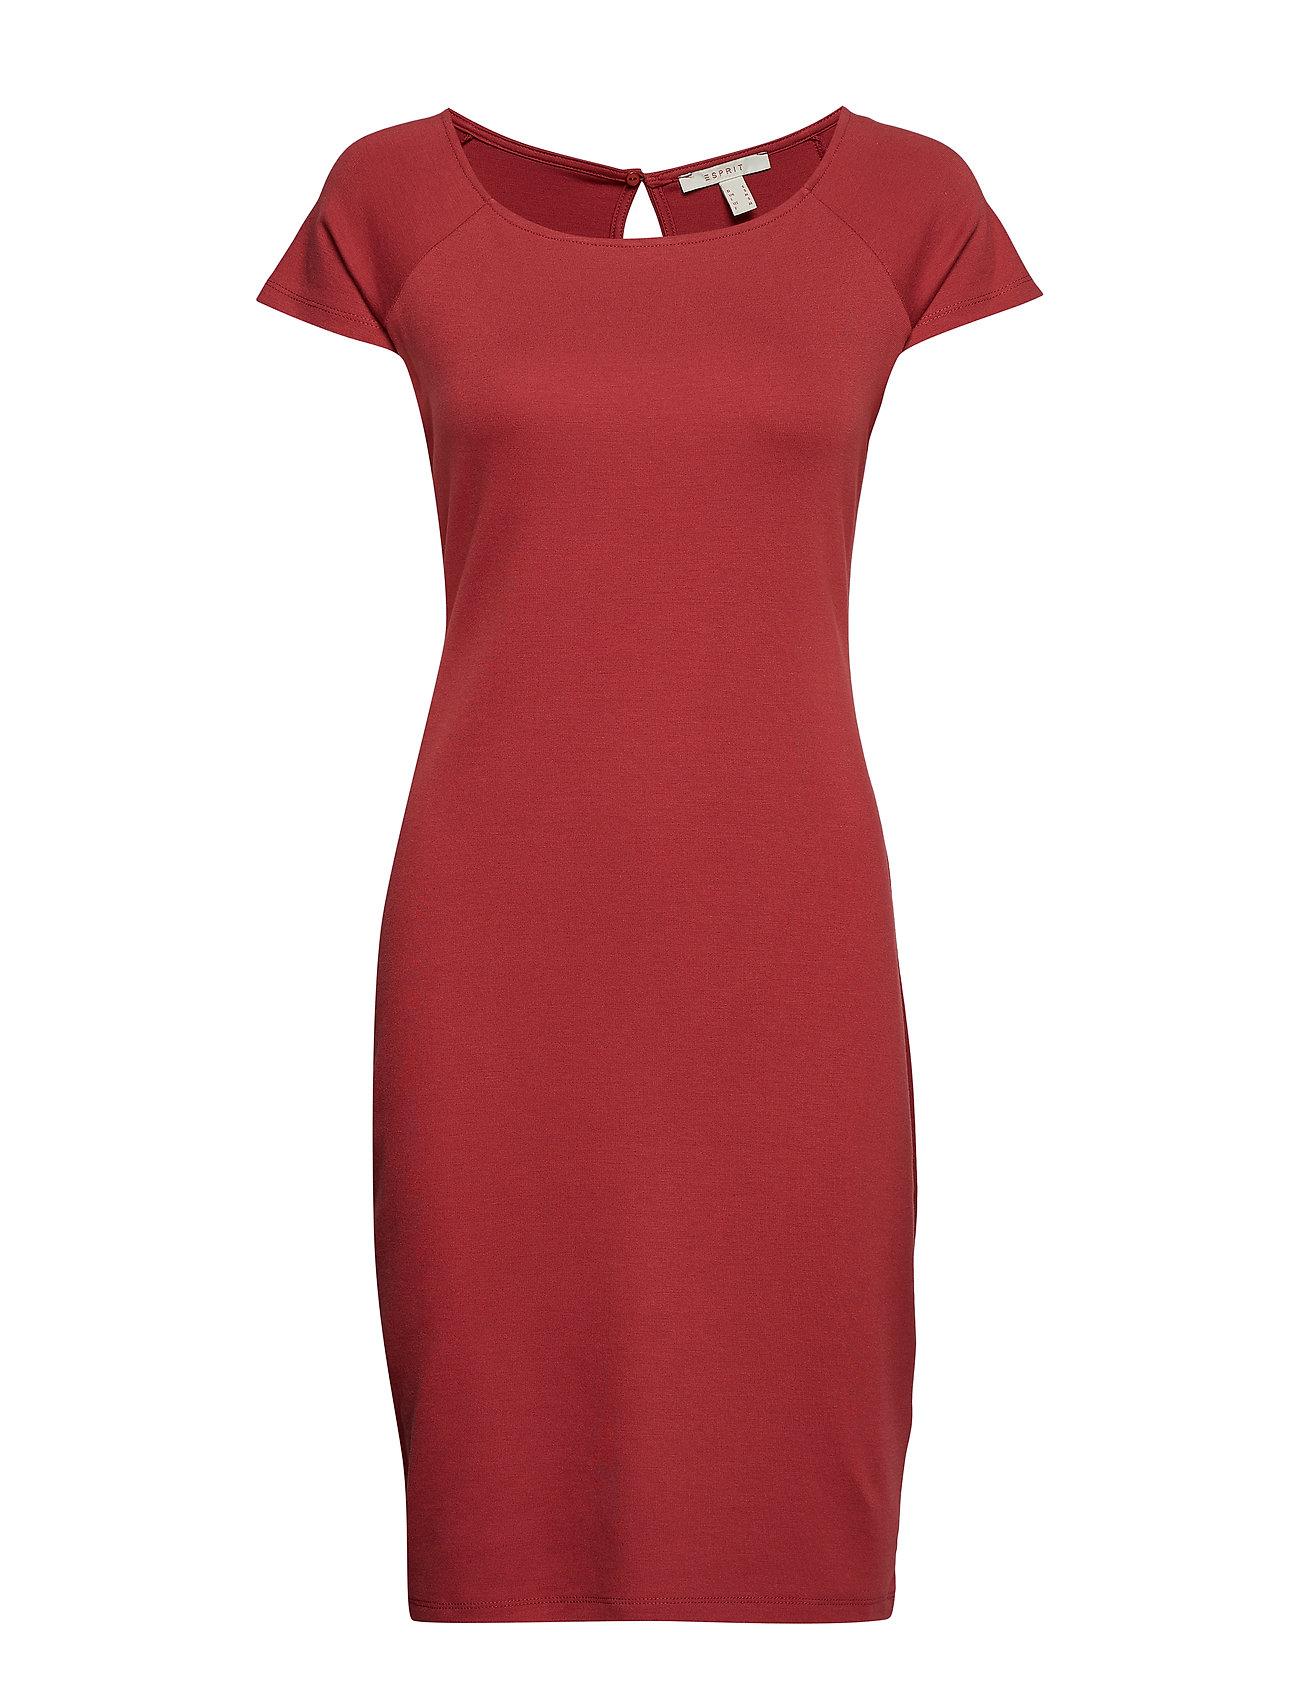 Knitteddark Casual Knitteddark RedEsprit Casual Dresses RedEsprit Dresses dCBerxo